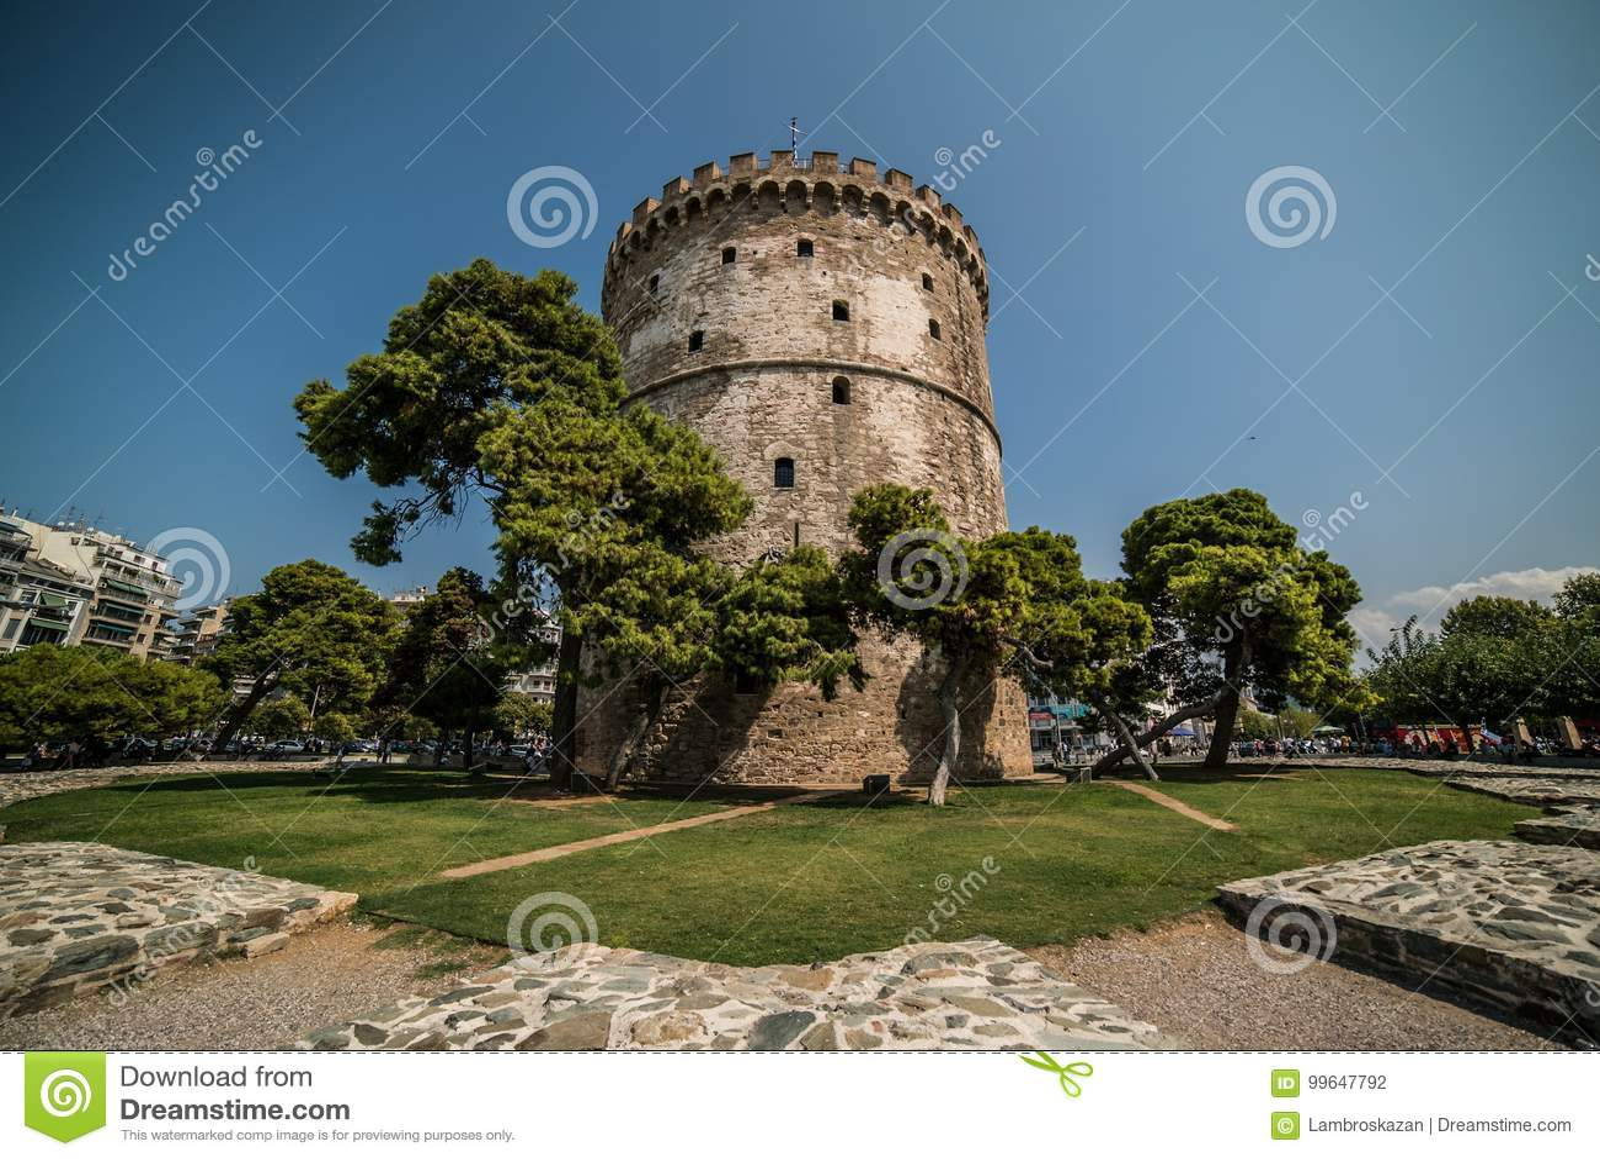 Torre blanca de Salónica, Grecia - d3ia con el Le granangular